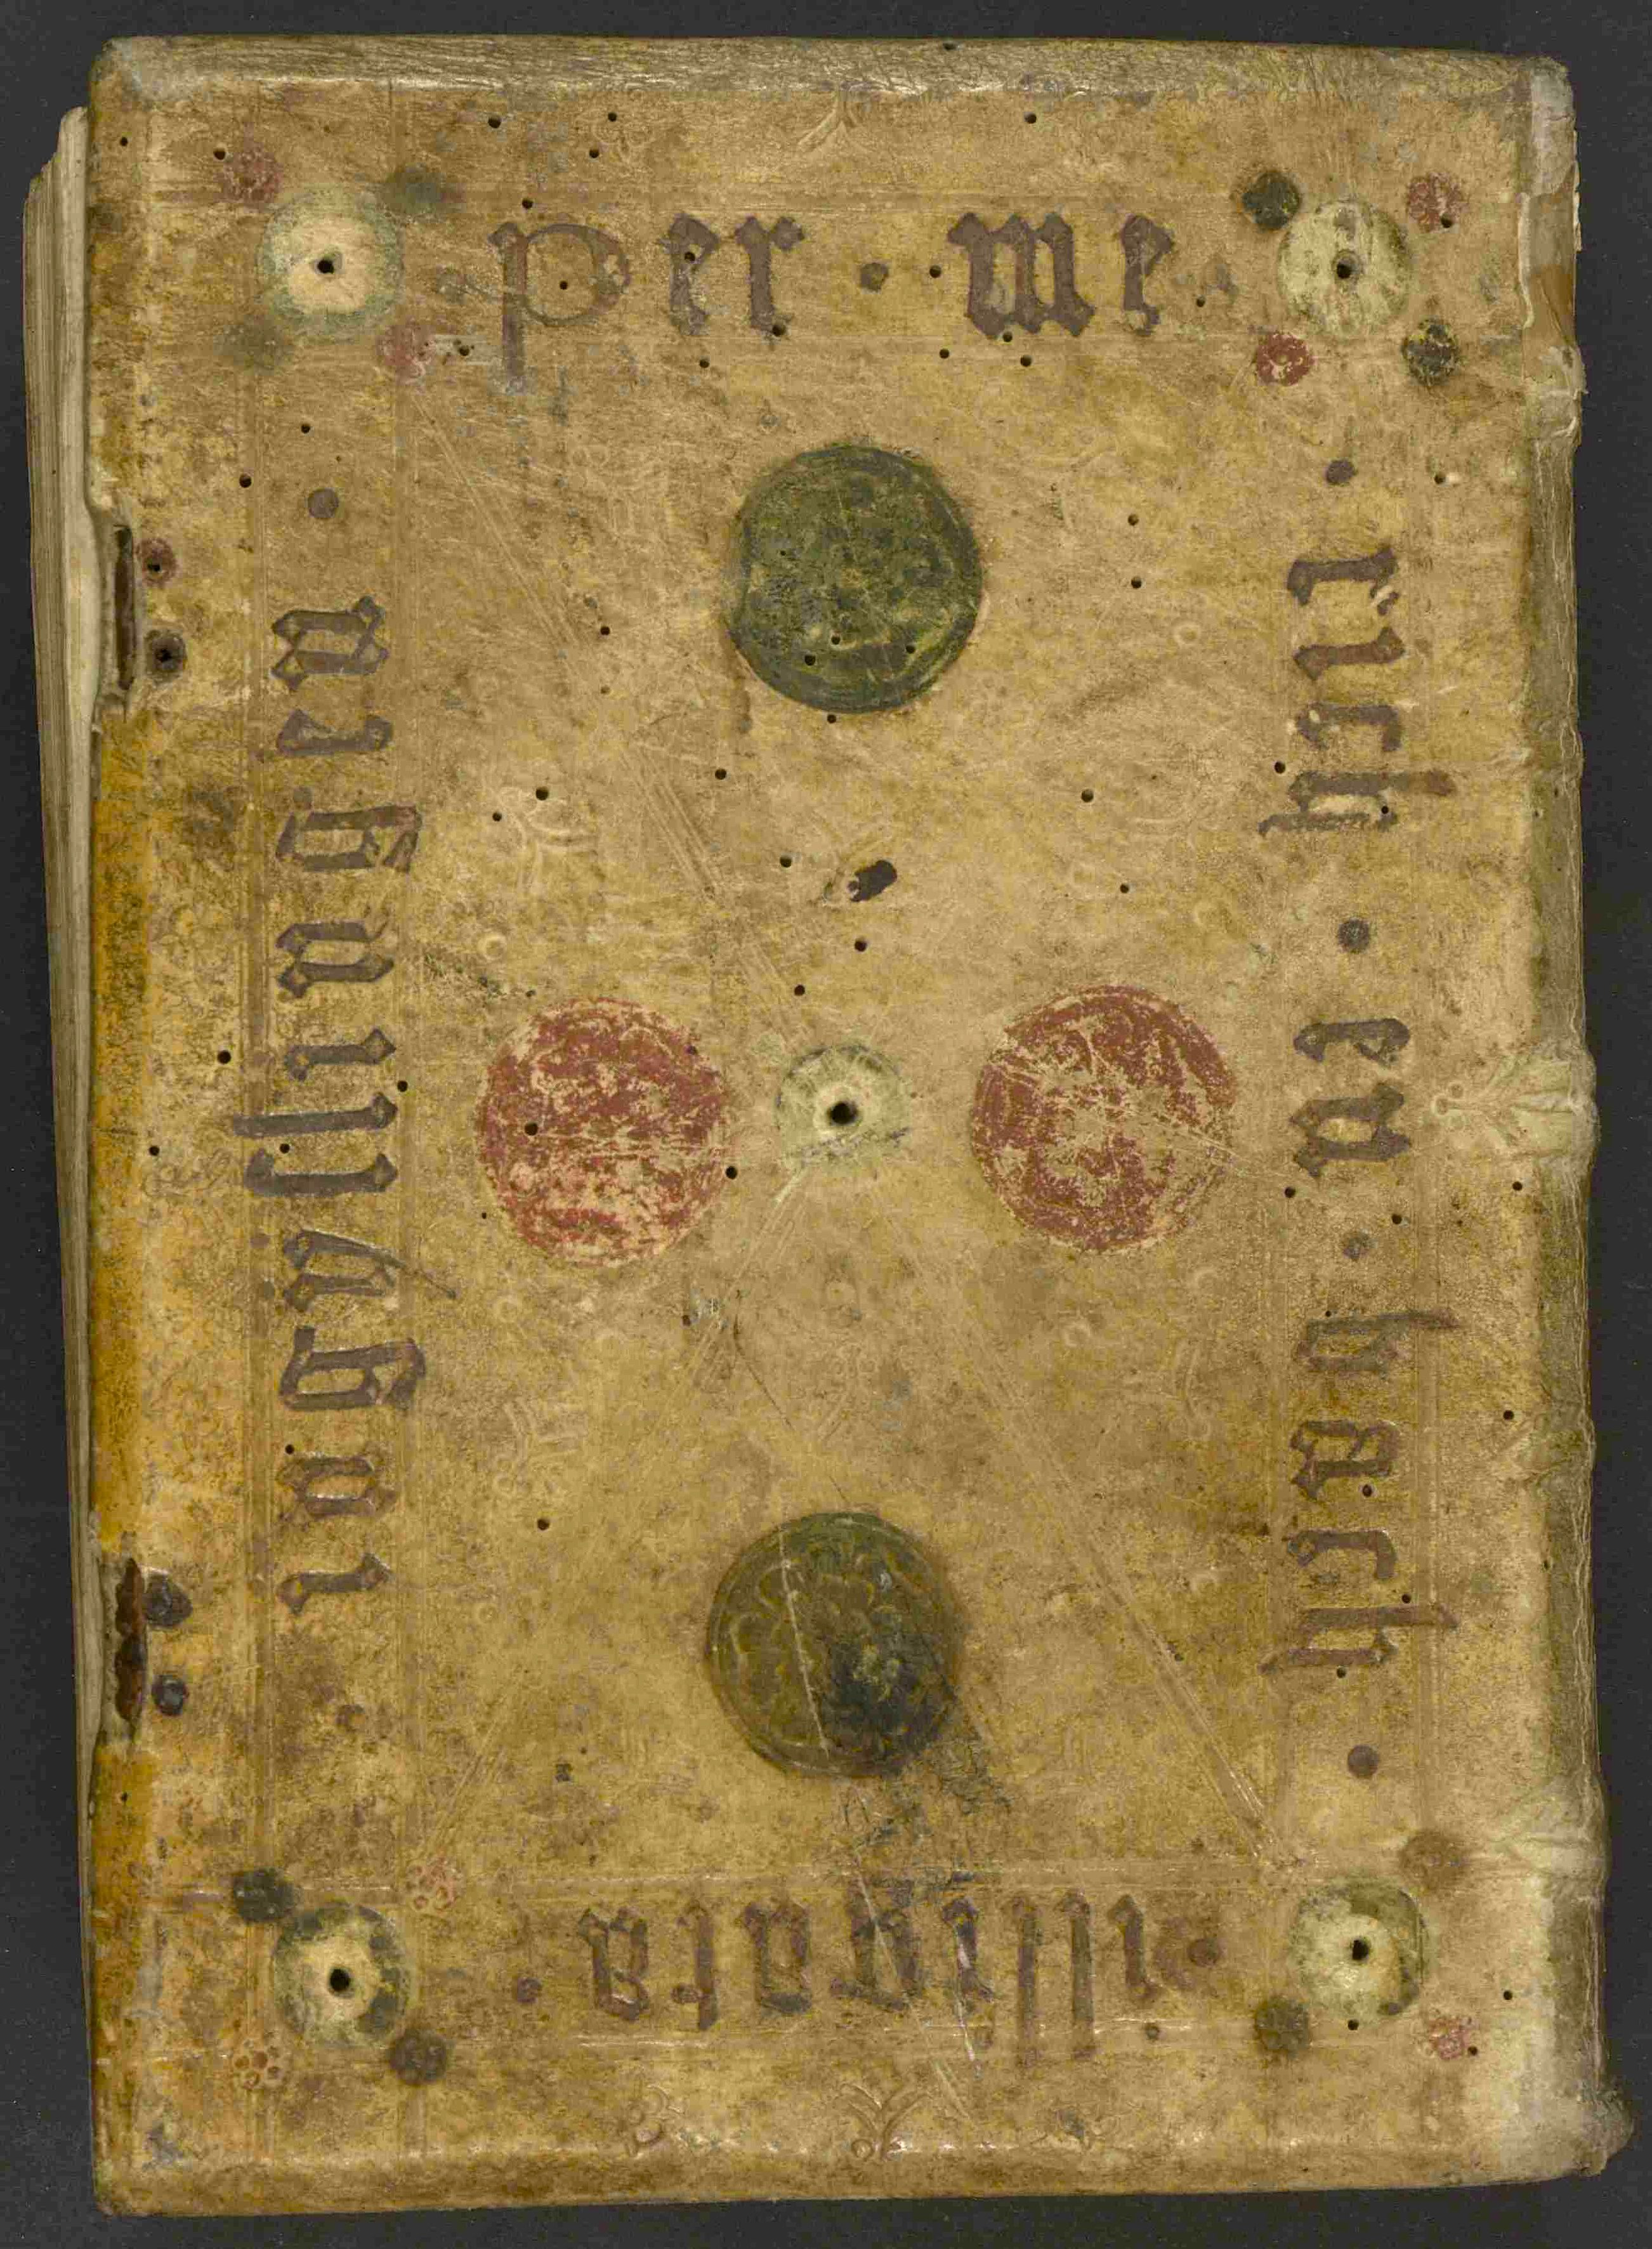 Sermones de tempore et de sanctis, Hinterdeckel mit Angabe des Buchbinders.jpg